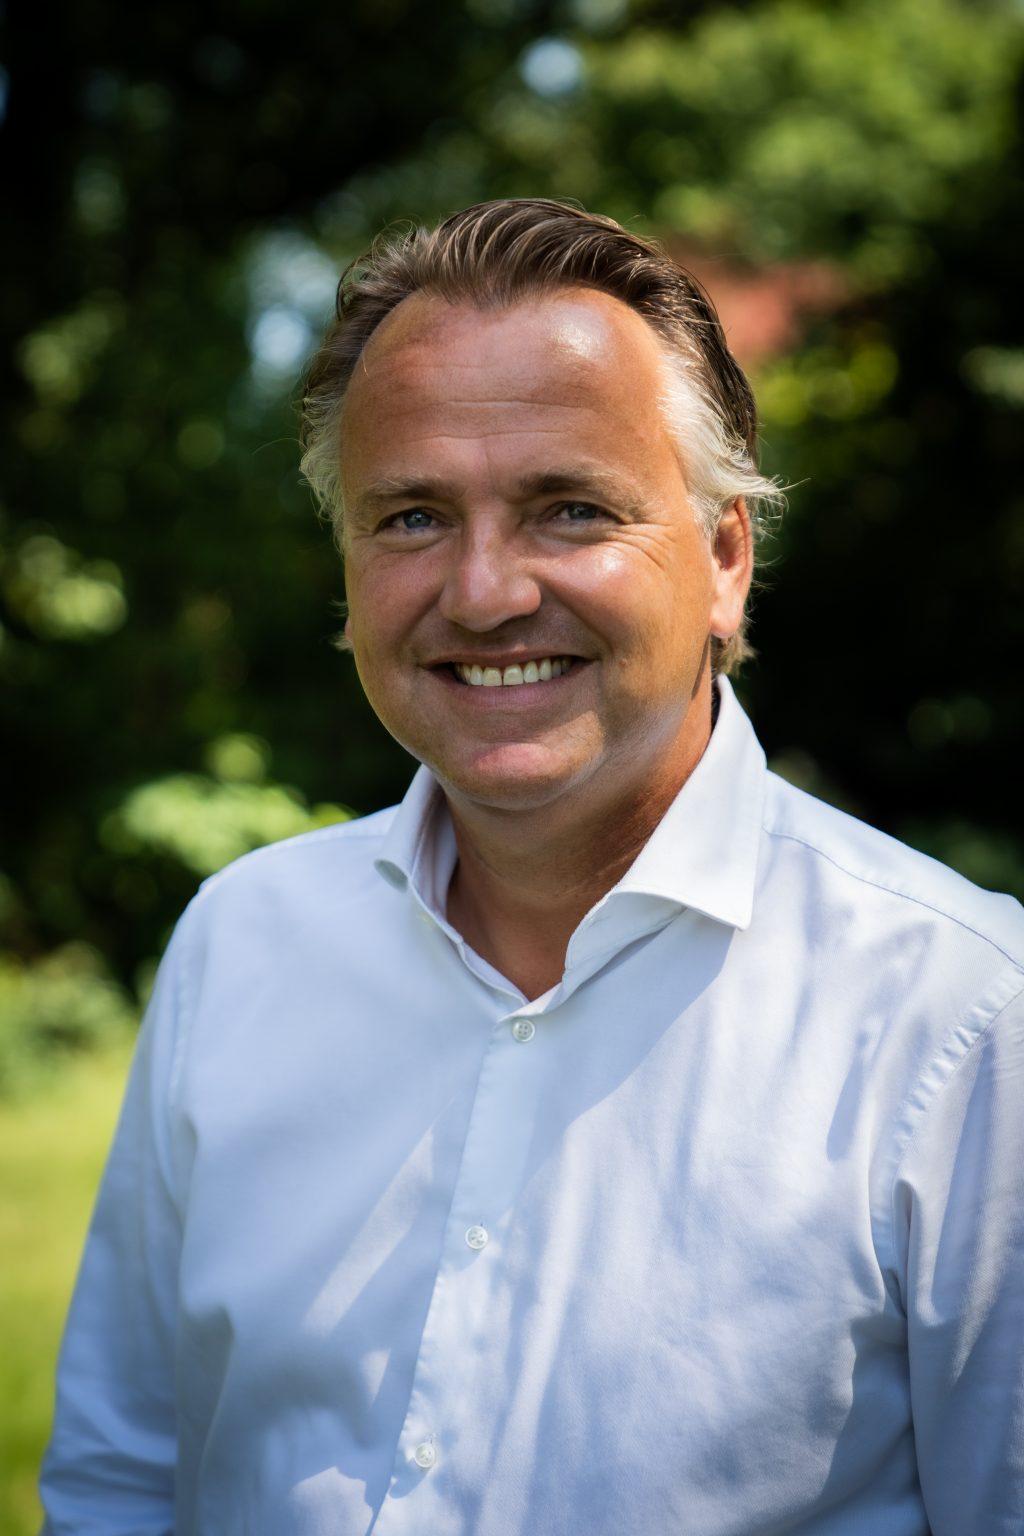 Dirk Lubbers